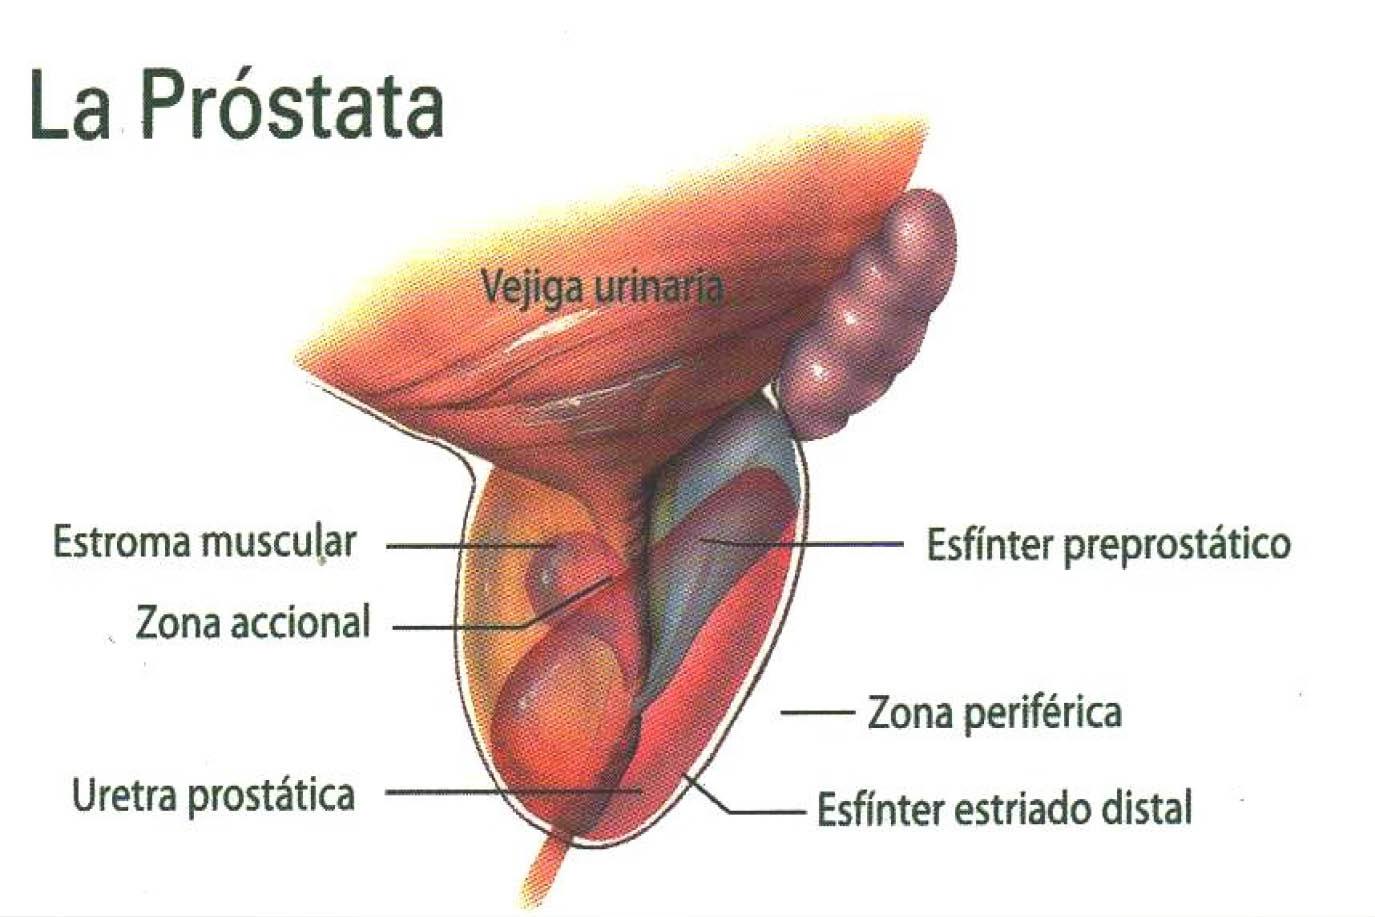 3. Anatomía Patológica